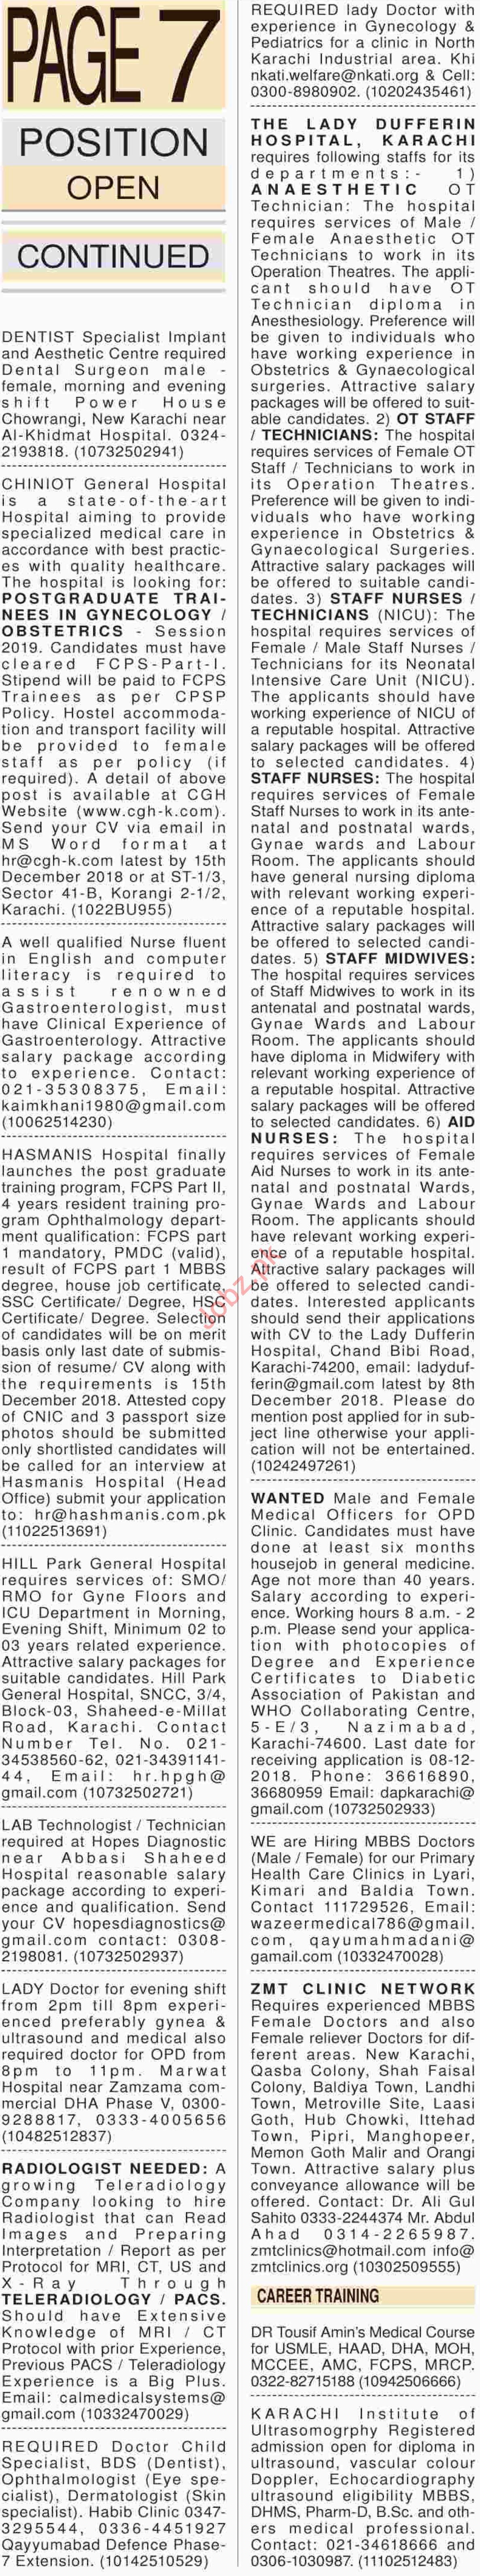 Dawn Newspaper Sunday Medical Classified Jobs 2/12/2018